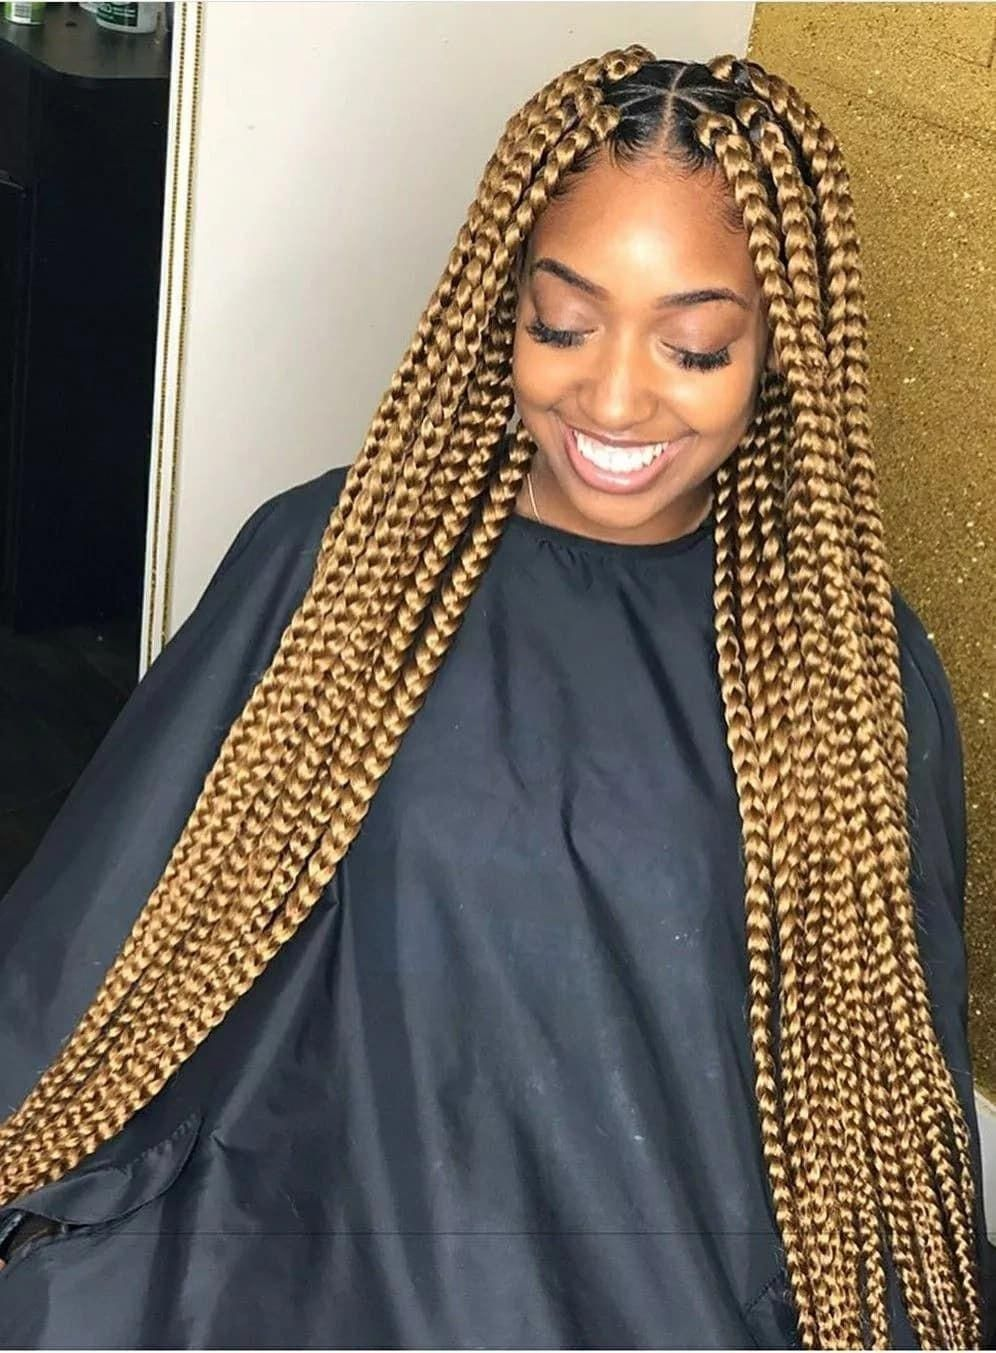 Jumbo Box Braids Hairstyles For Nigerian Beauties A Legitng Big Box Braids Hairstyle Braidshairst Big Box Braids Hairstyles Blonde Braids Box Braids Styling